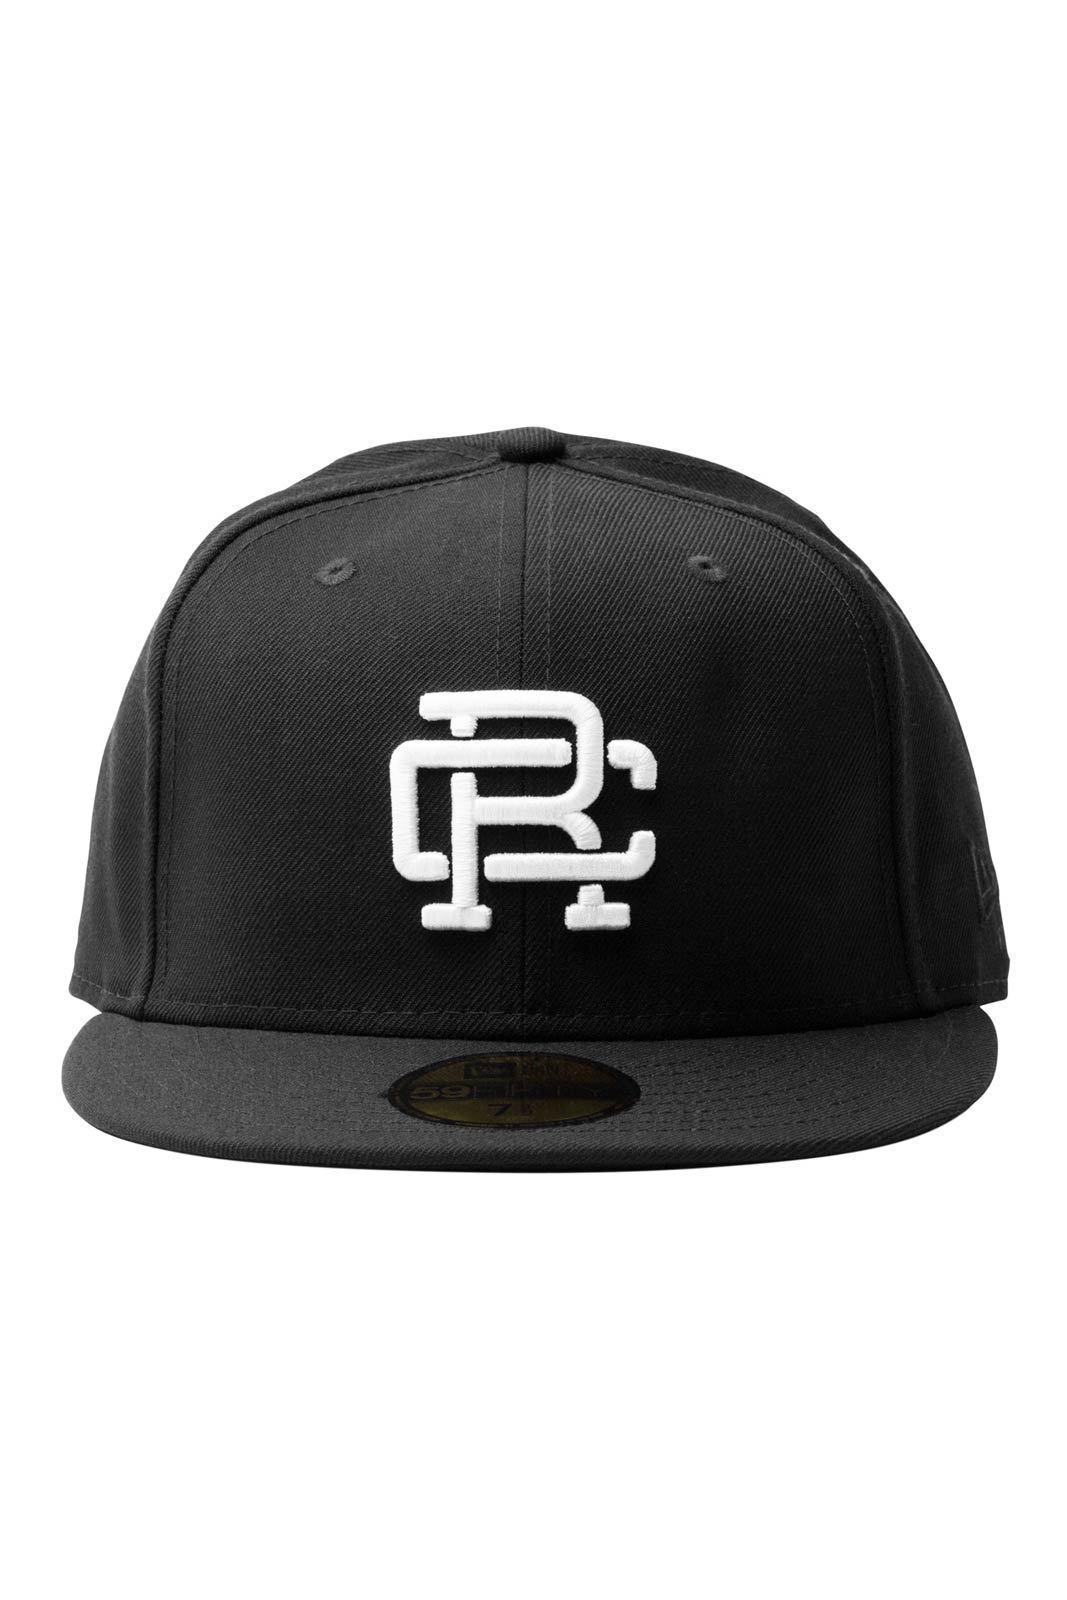 436a865d7f2 Lyst - Reigning Champ X New Era Cap in Black for Men